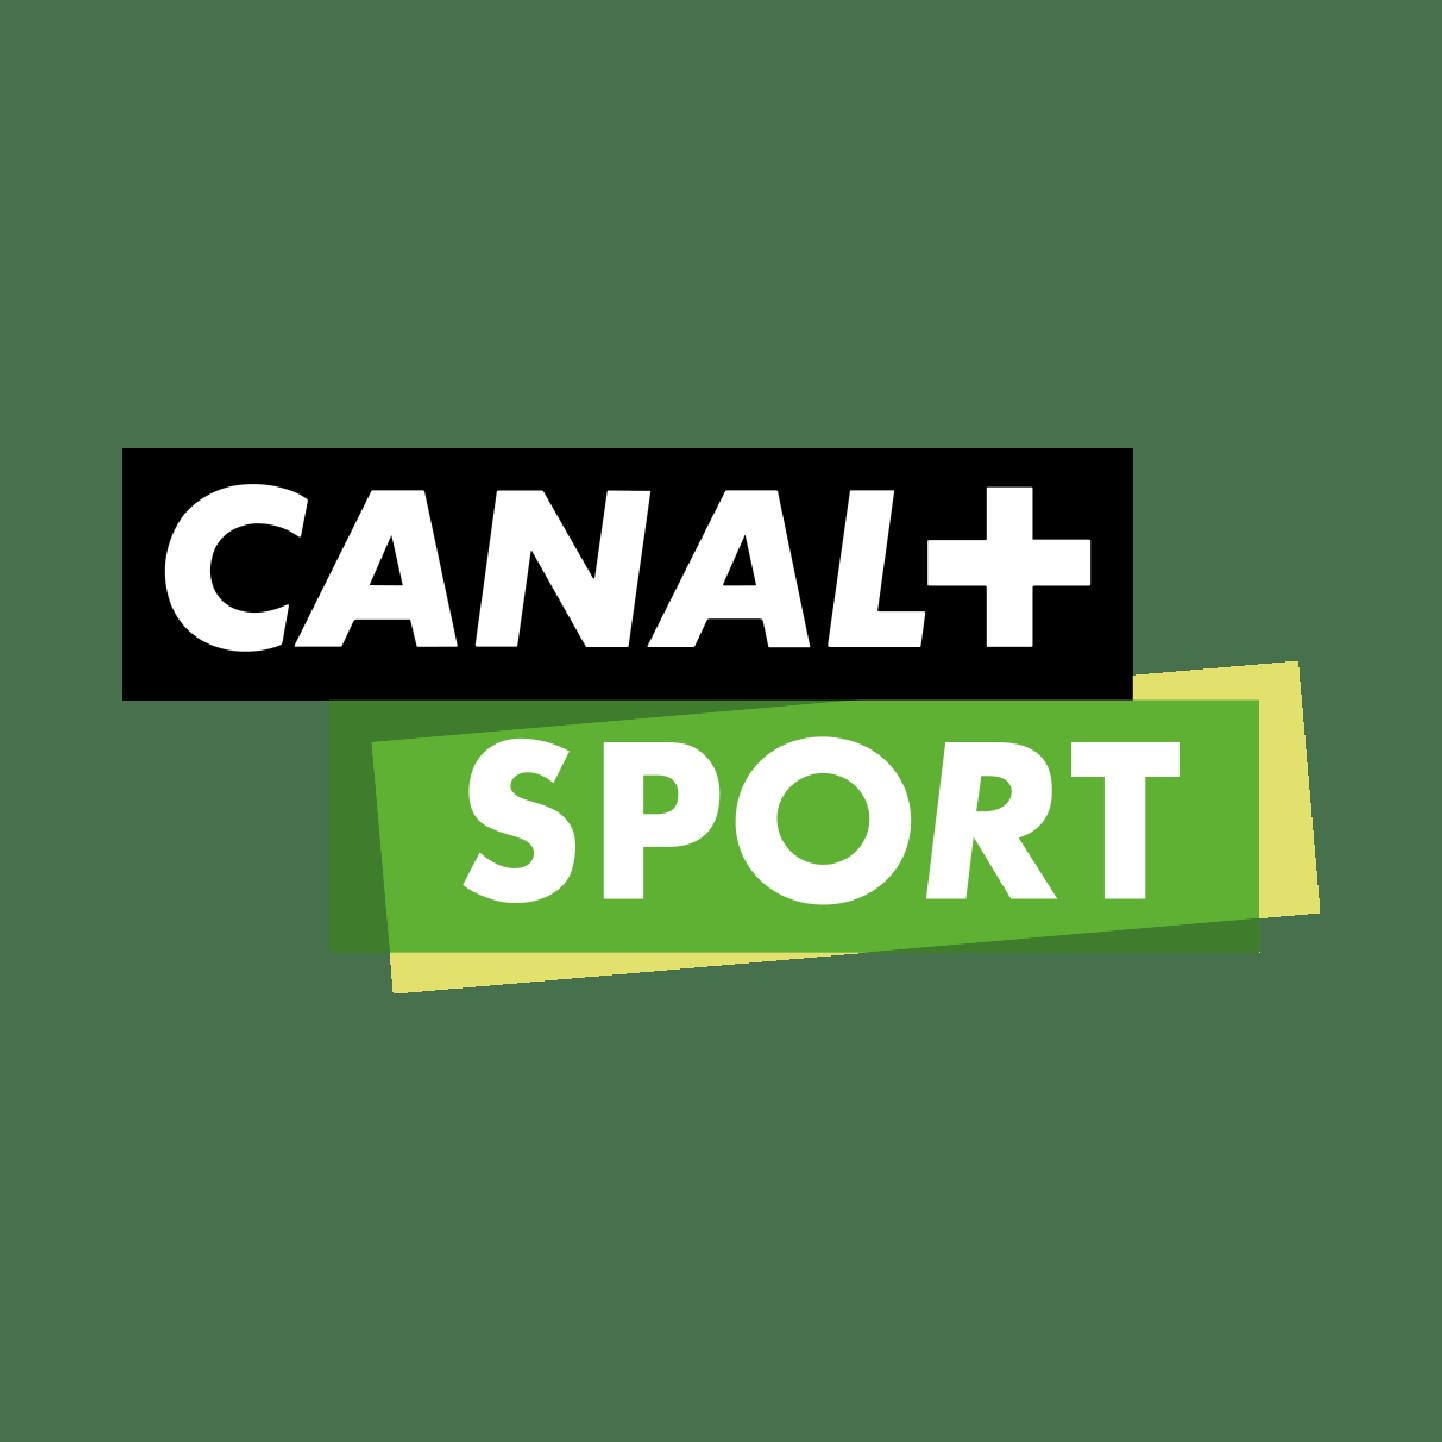 logo CANAL+ Sport